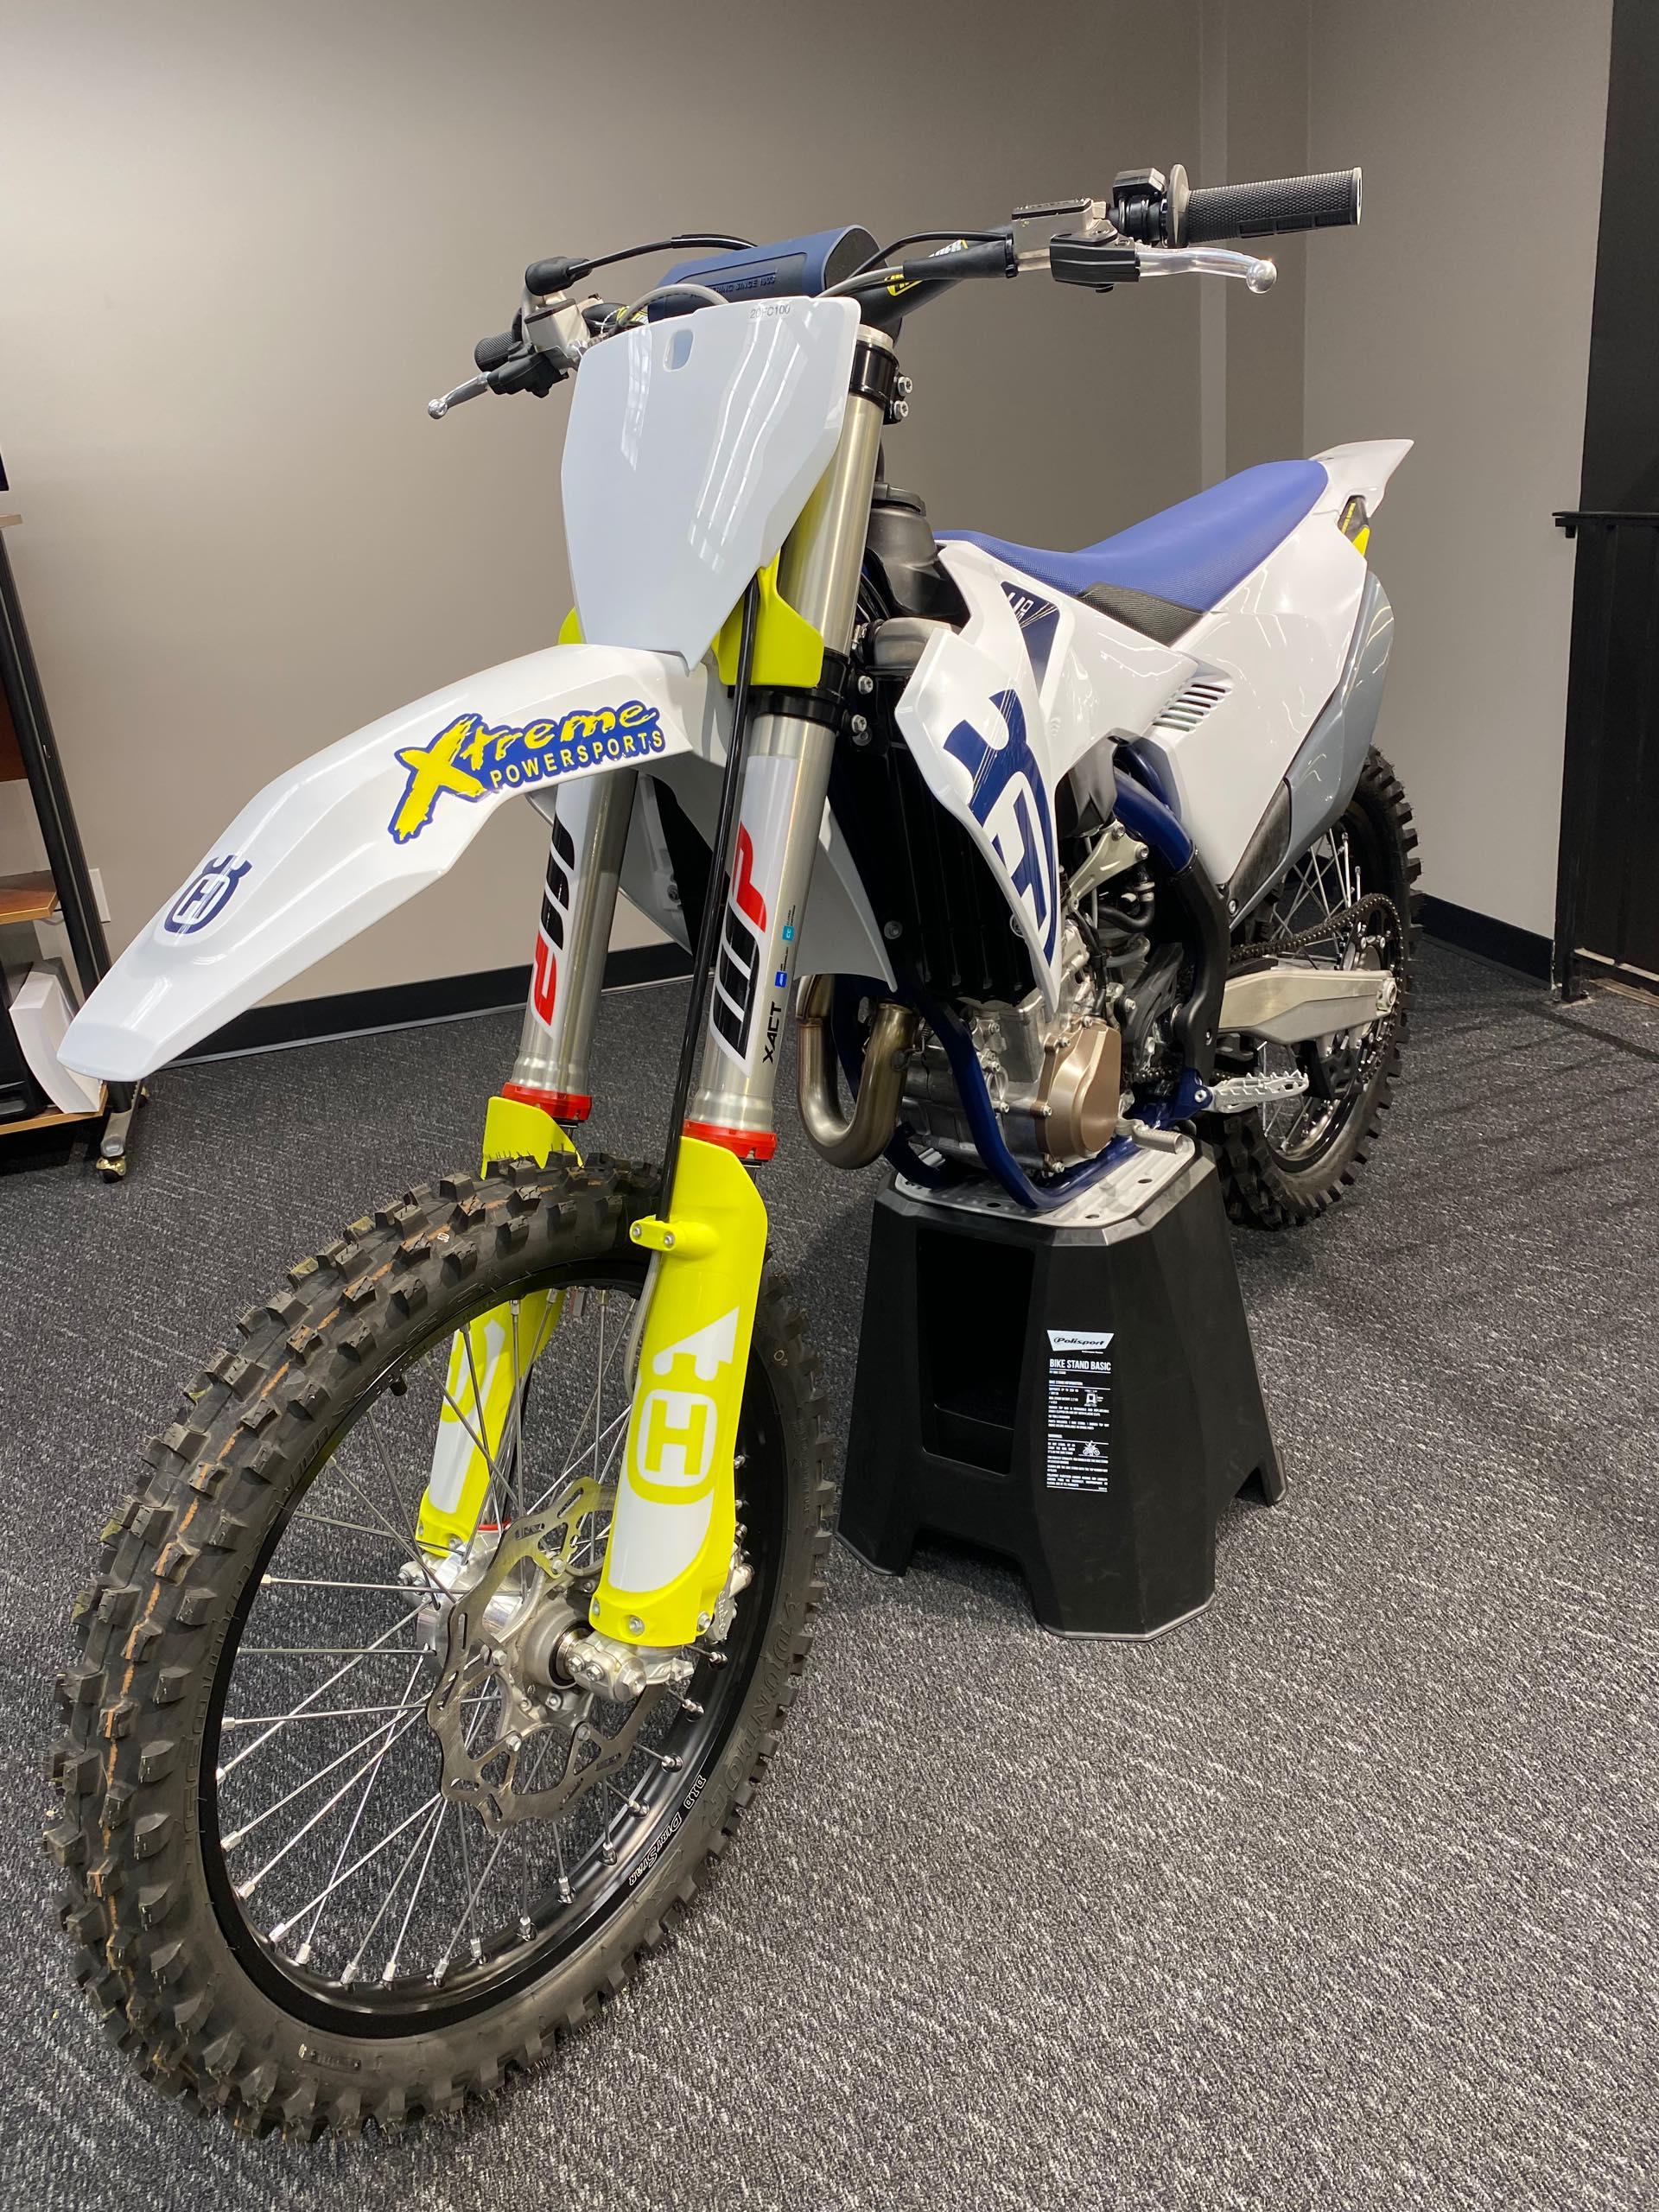 2020 Husqvarna FC 450 at Sloans Motorcycle ATV, Murfreesboro, TN, 37129